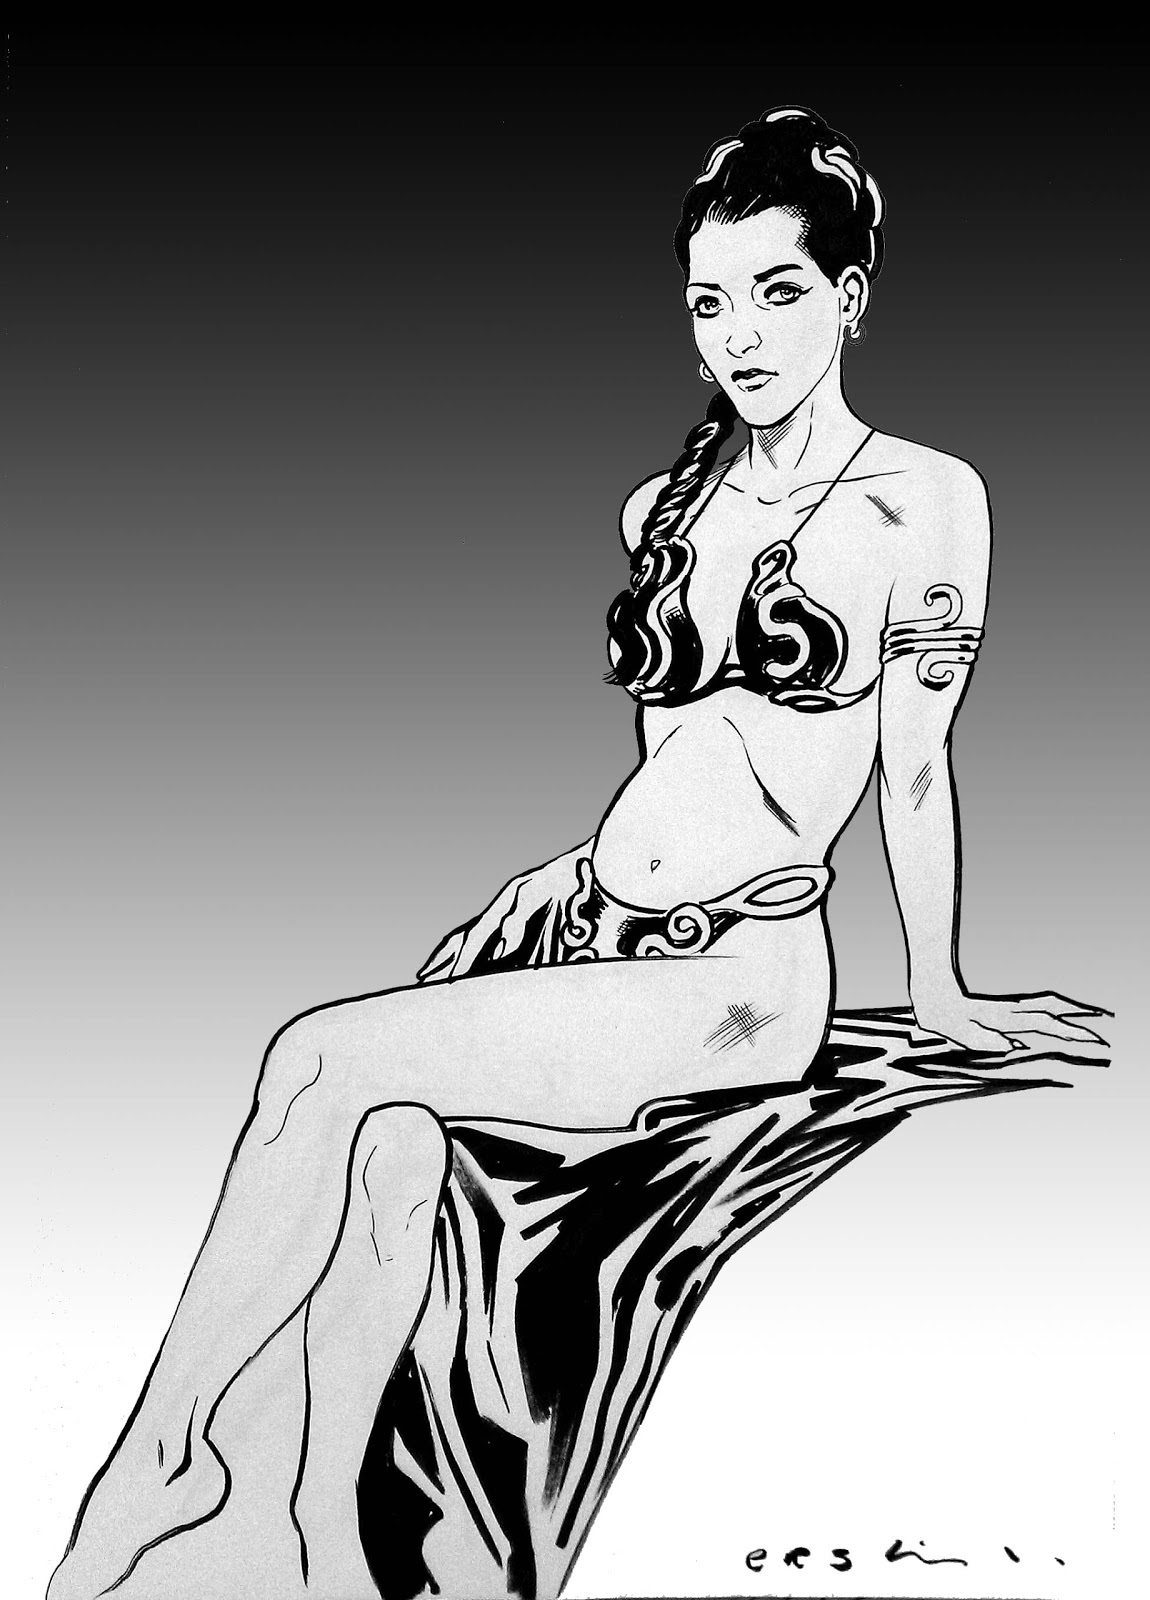 Cheaply got, Princess leia gold bikini picture